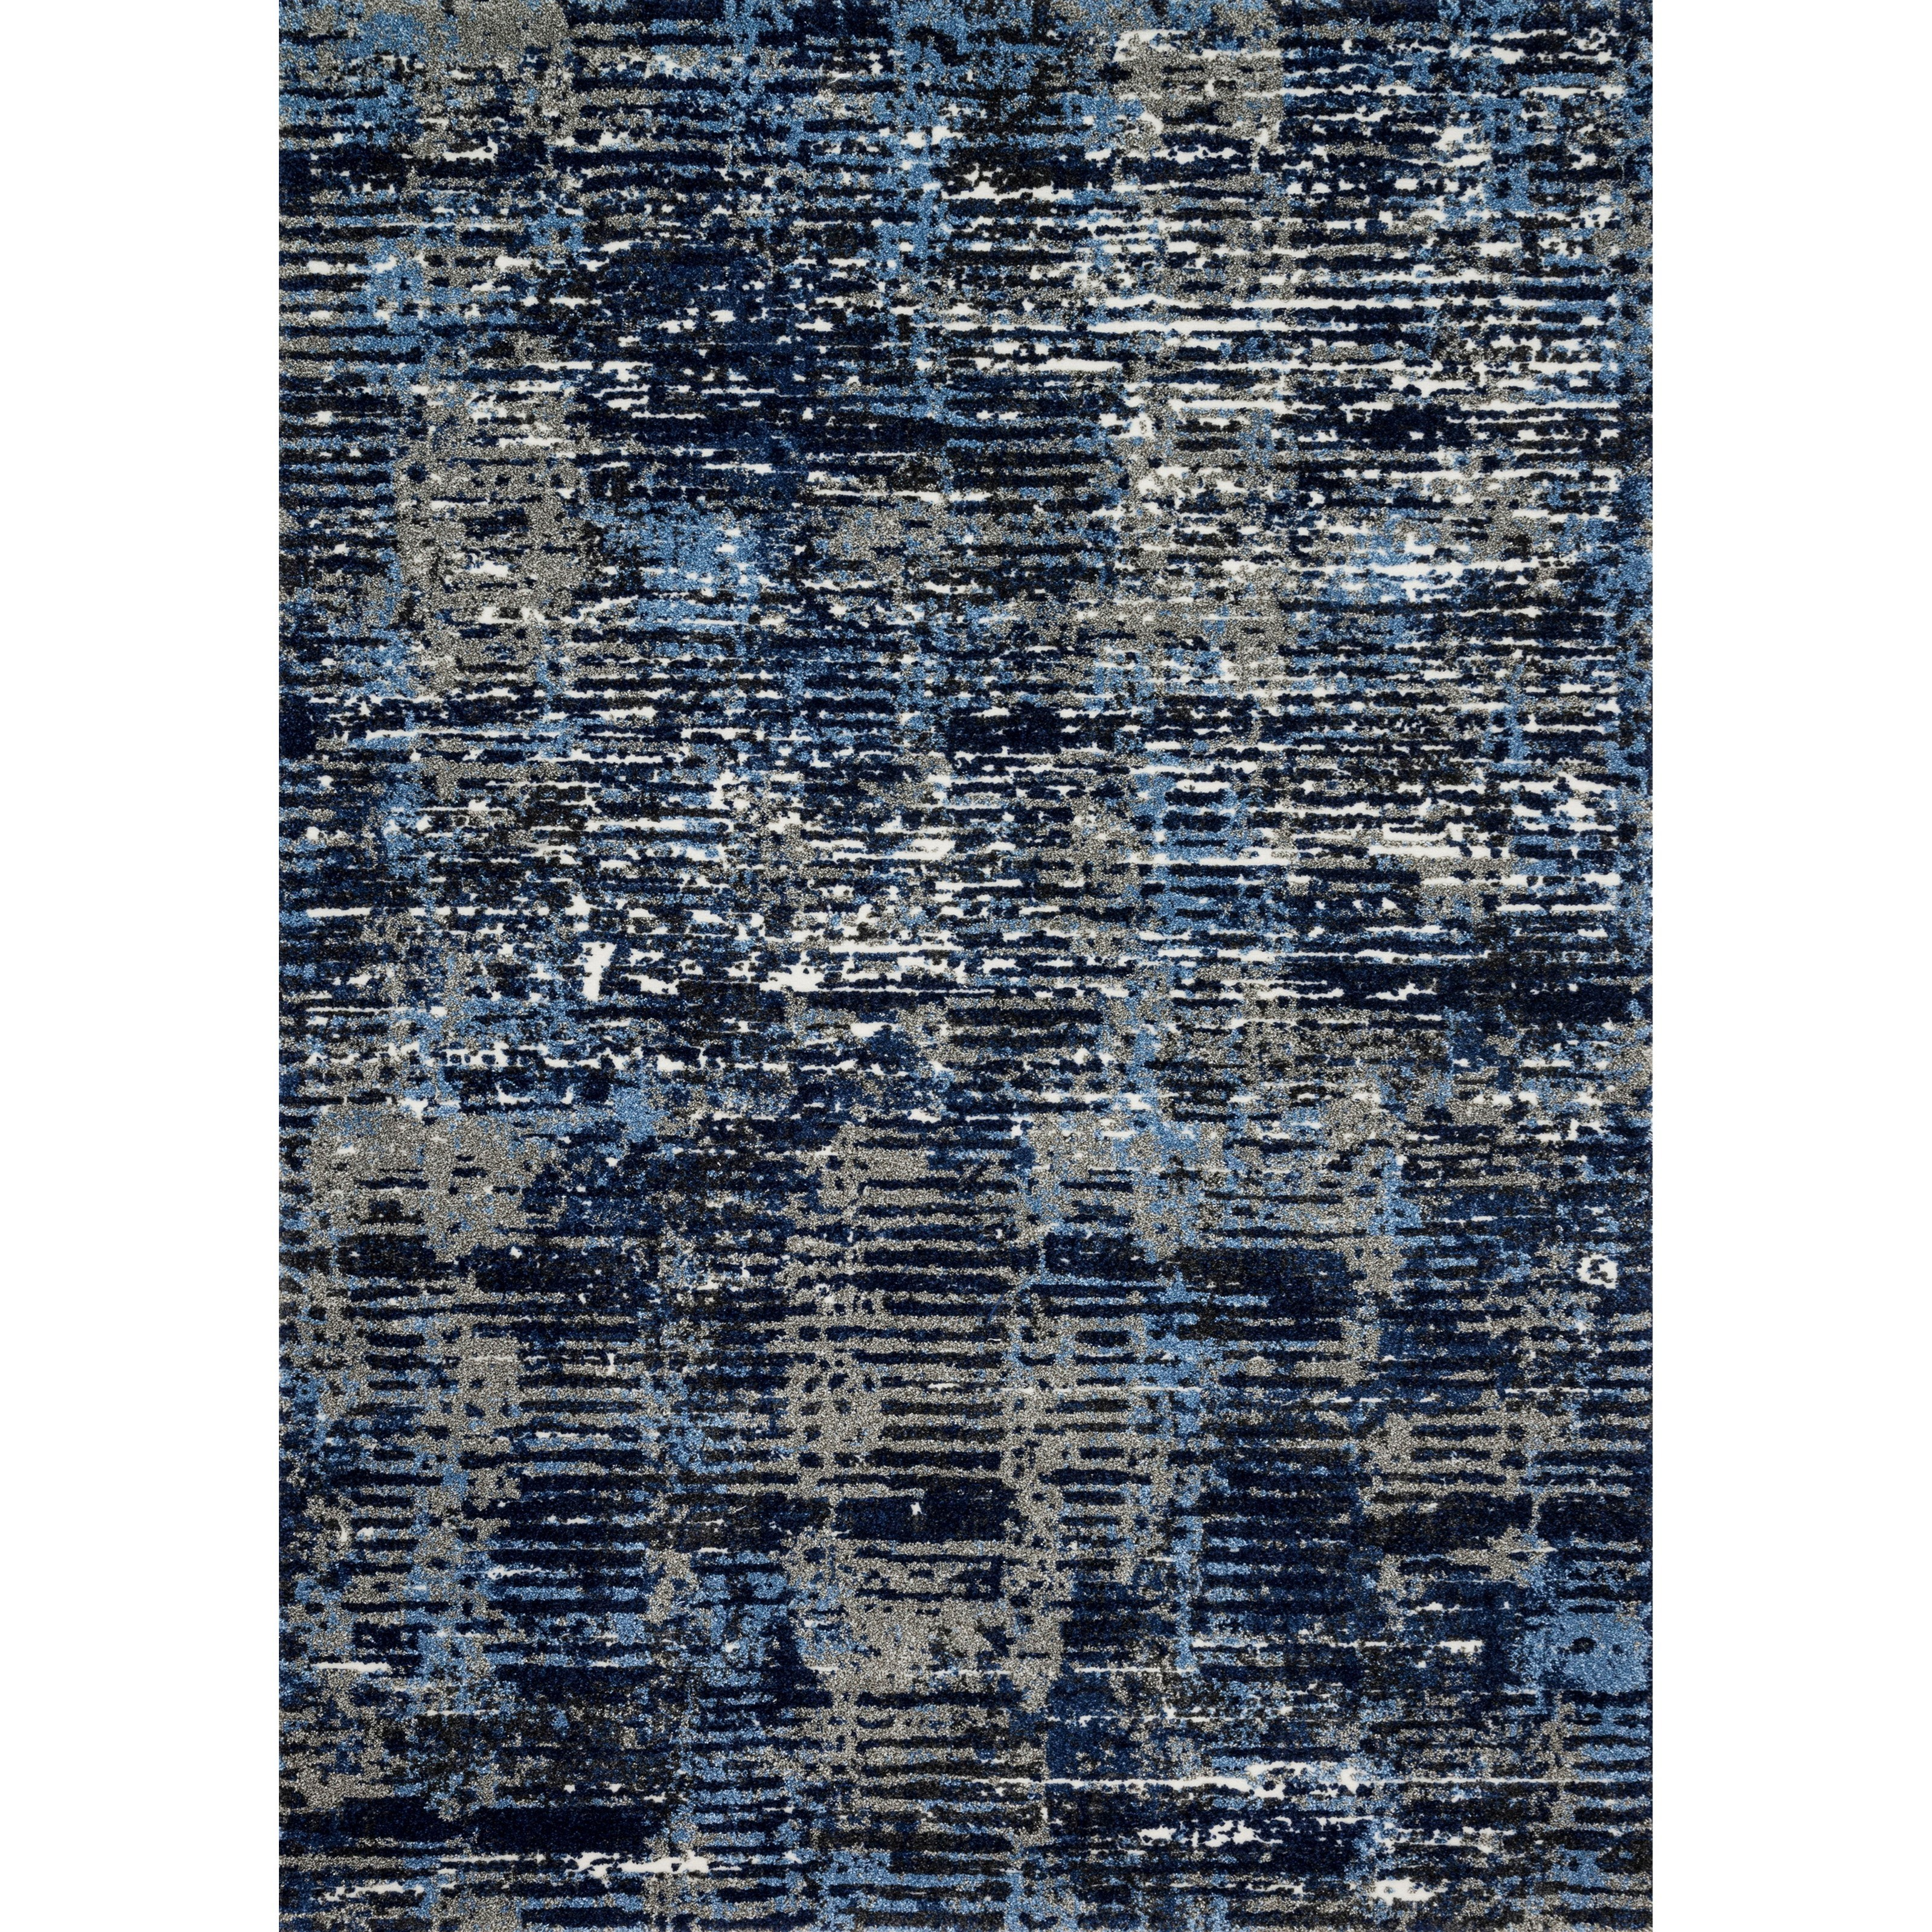 "Viera 1'6"" x 1'6""  Dark Blue / Grey Rug by Loloi Rugs at Sprintz Furniture"